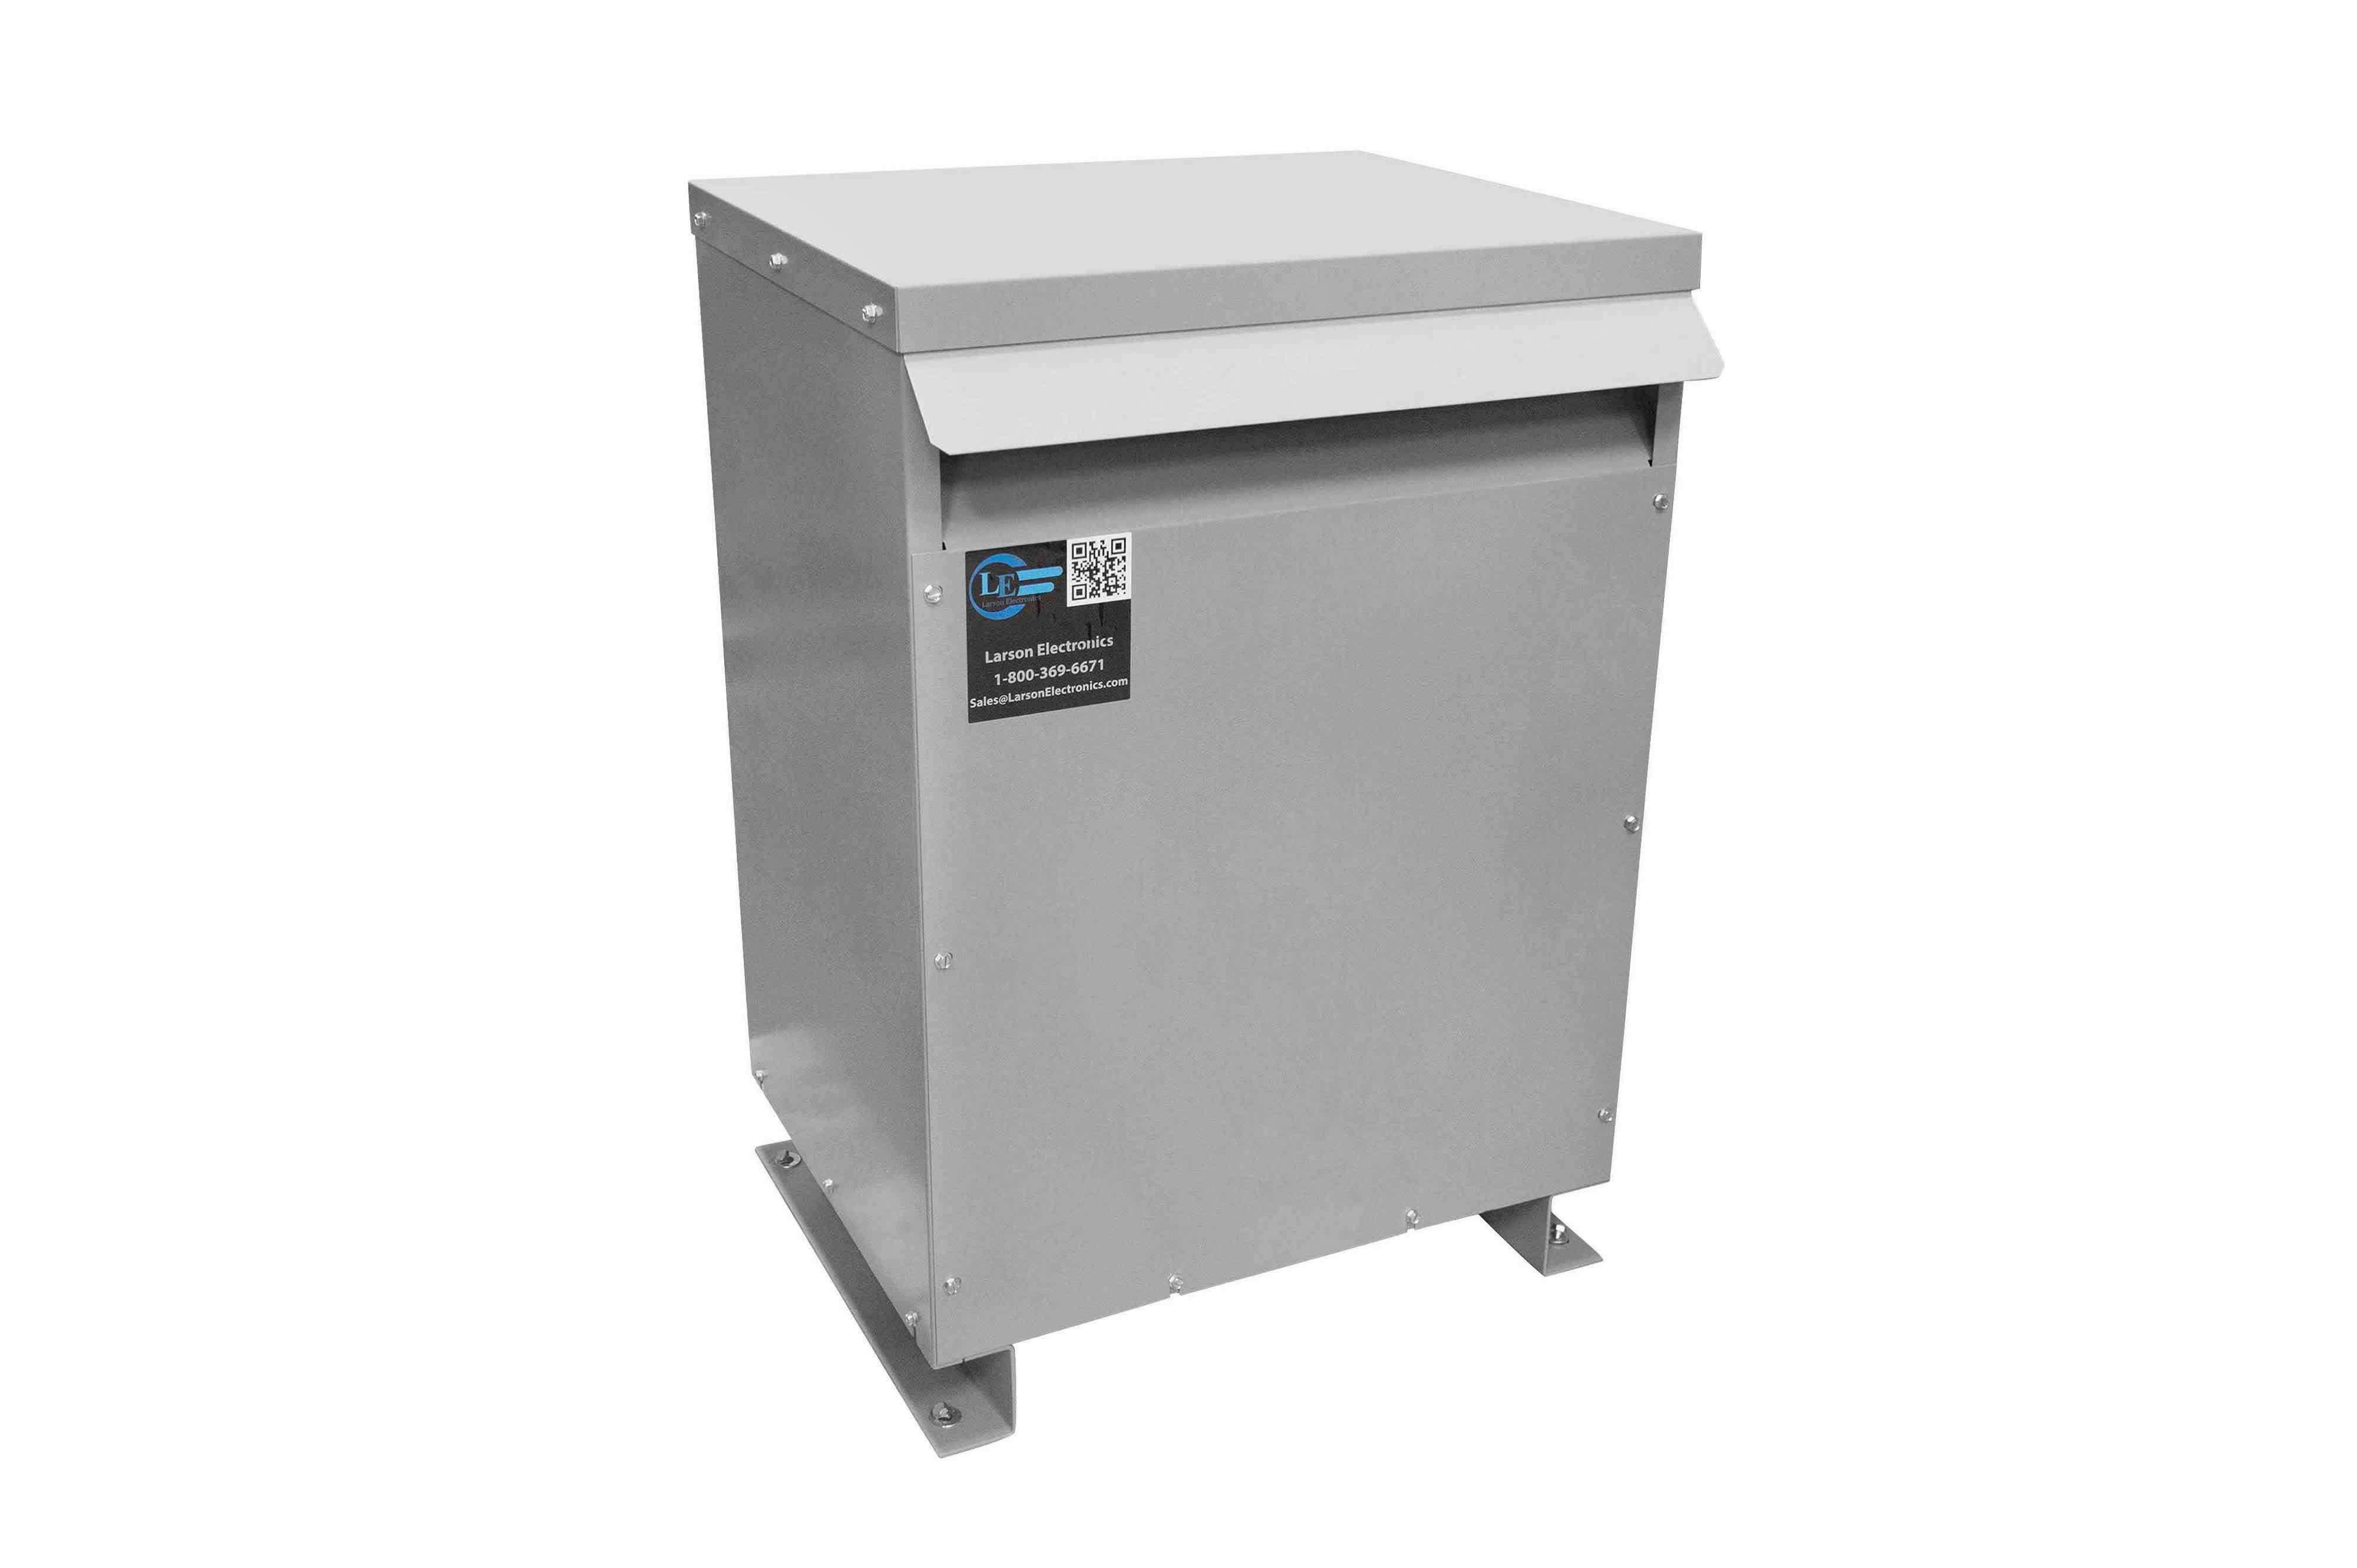 12 kVA 3PH Isolation Transformer, 208V Wye Primary, 400V Delta Secondary, N3R, Ventilated, 60 Hz